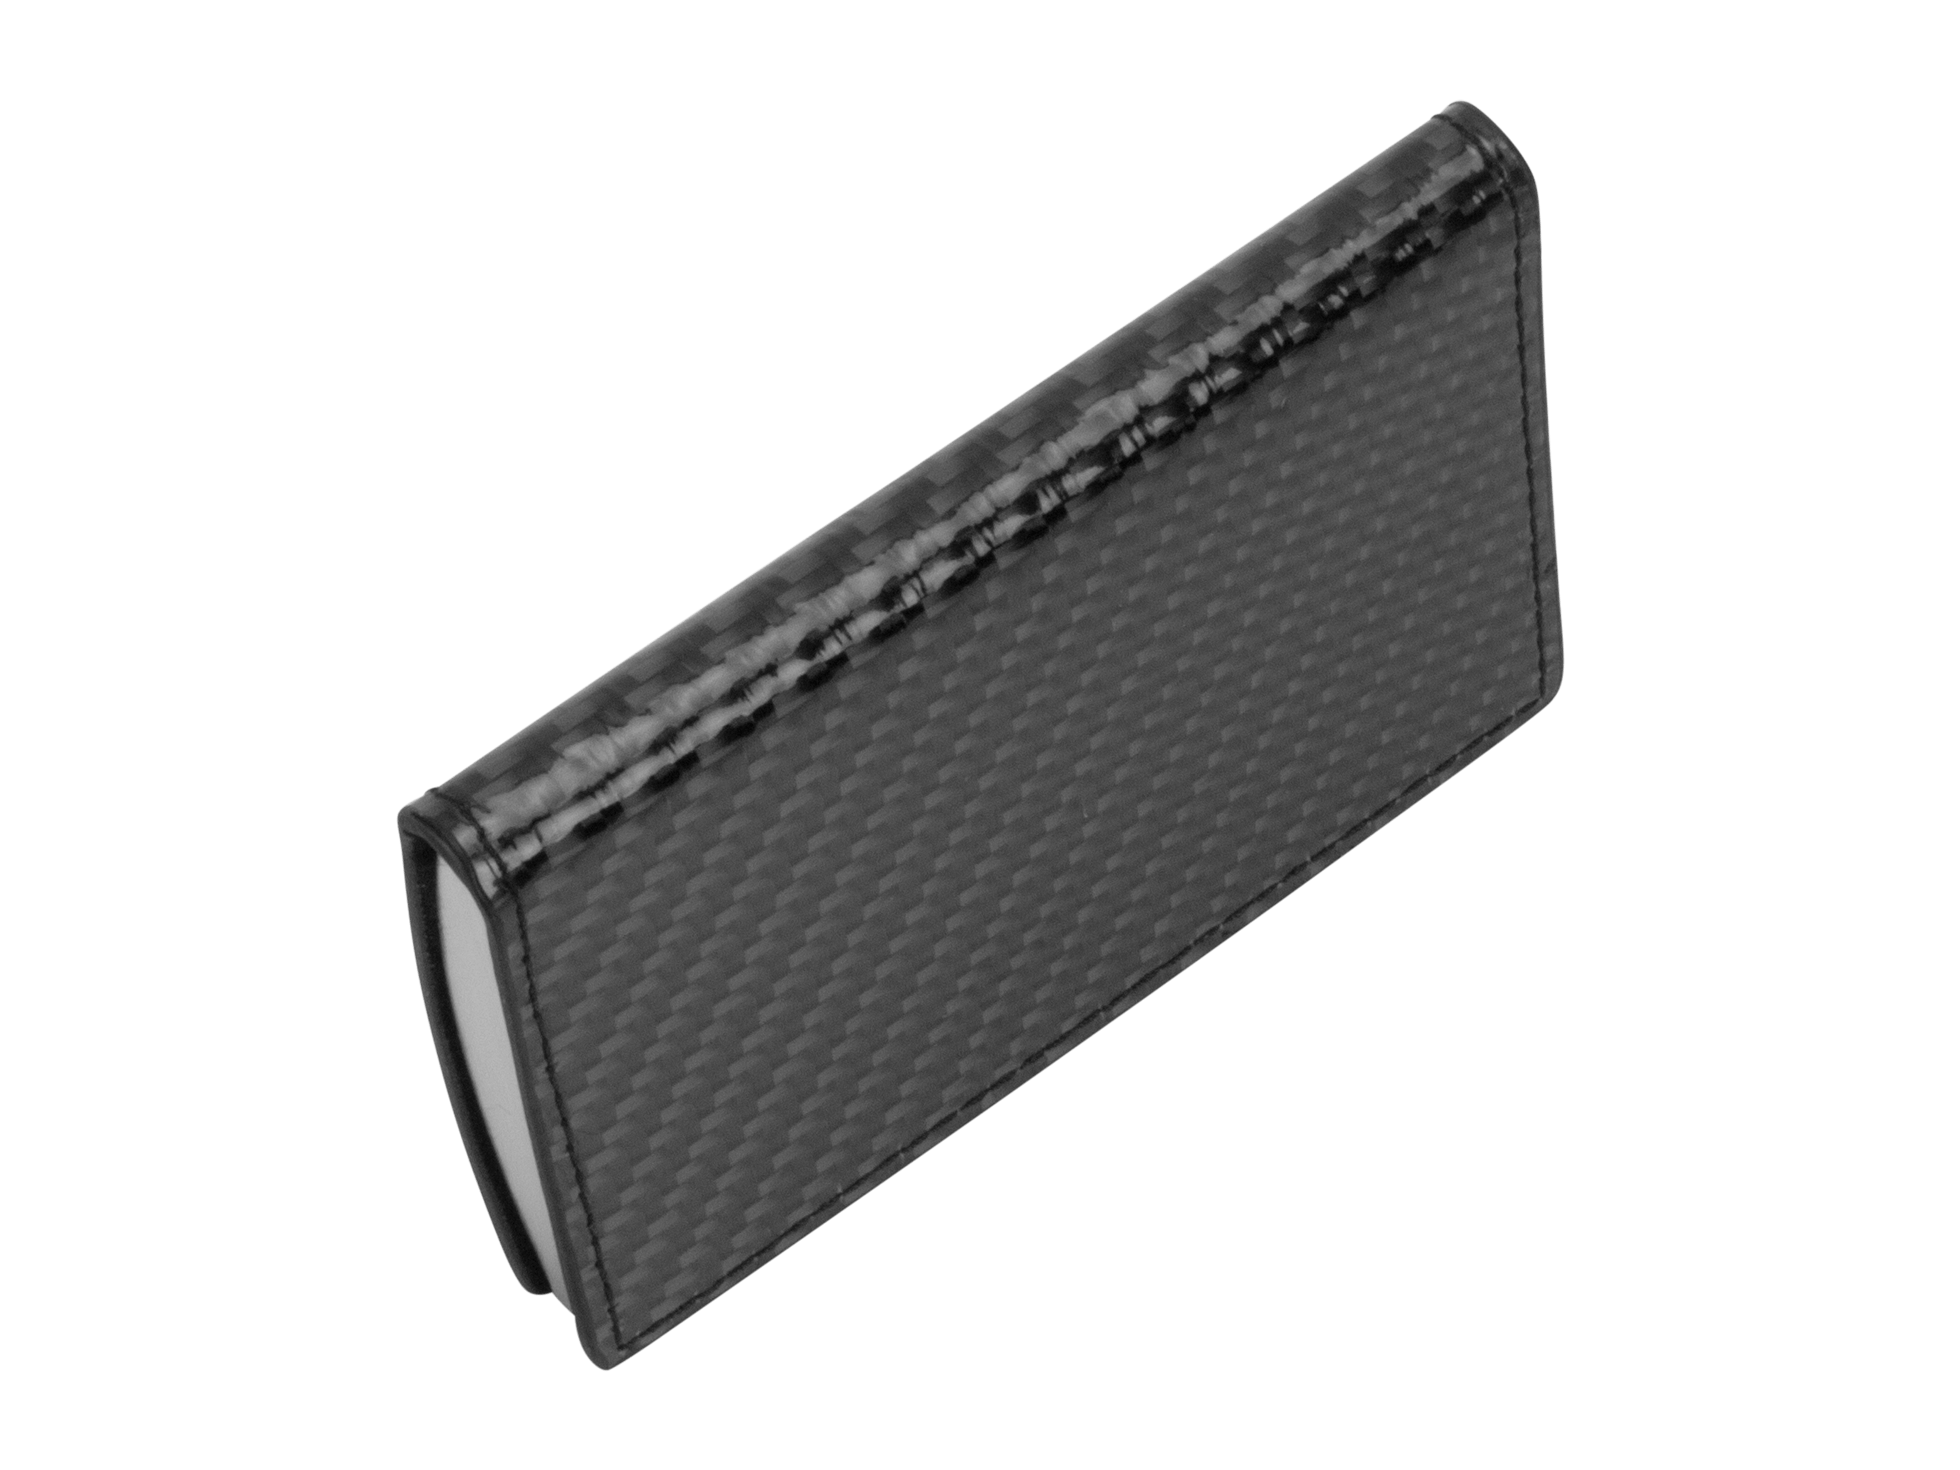 image transparent stock Flexy Carbon Fiber Business Card Holder